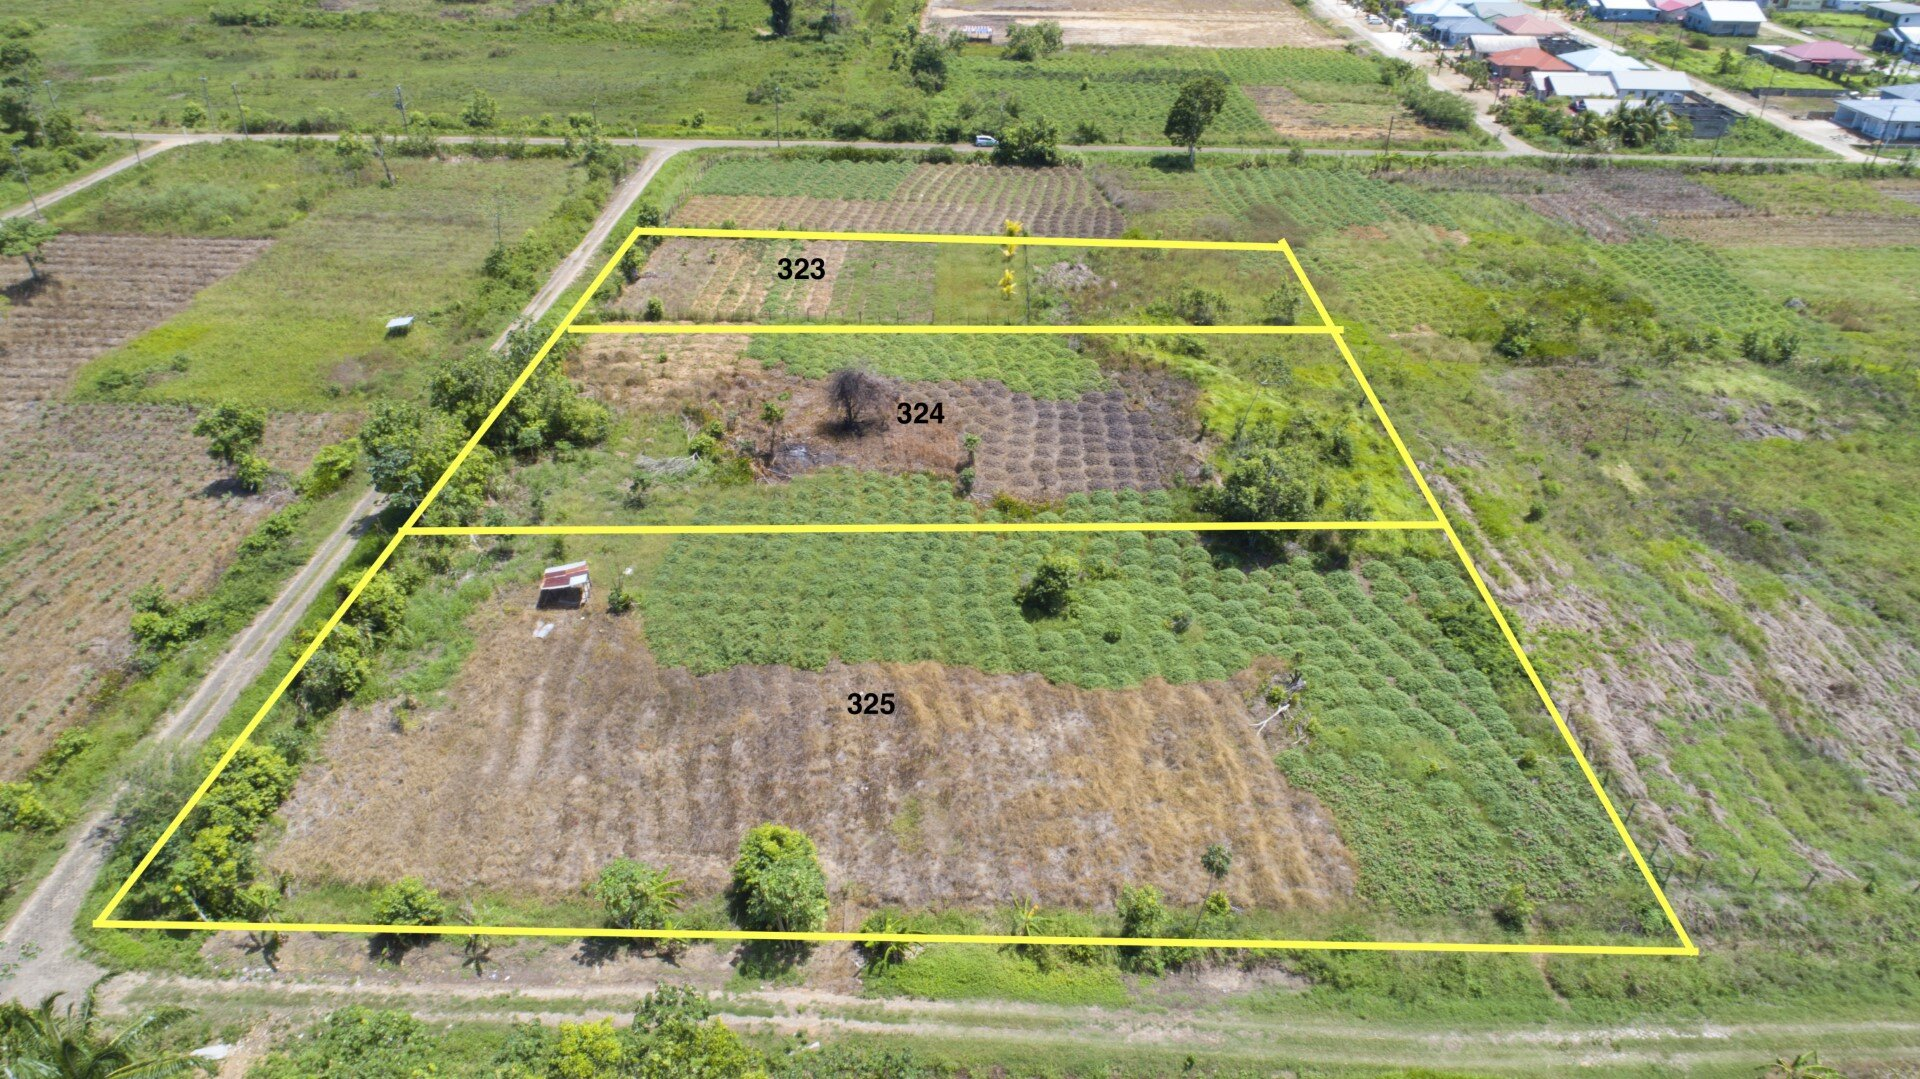 Atreusweg perceel nr. 323, 324 & 325 - 3 ruime percelen te Garnizoenspad - Surgoed Makelaardij NV - Paramaribo, Suriname